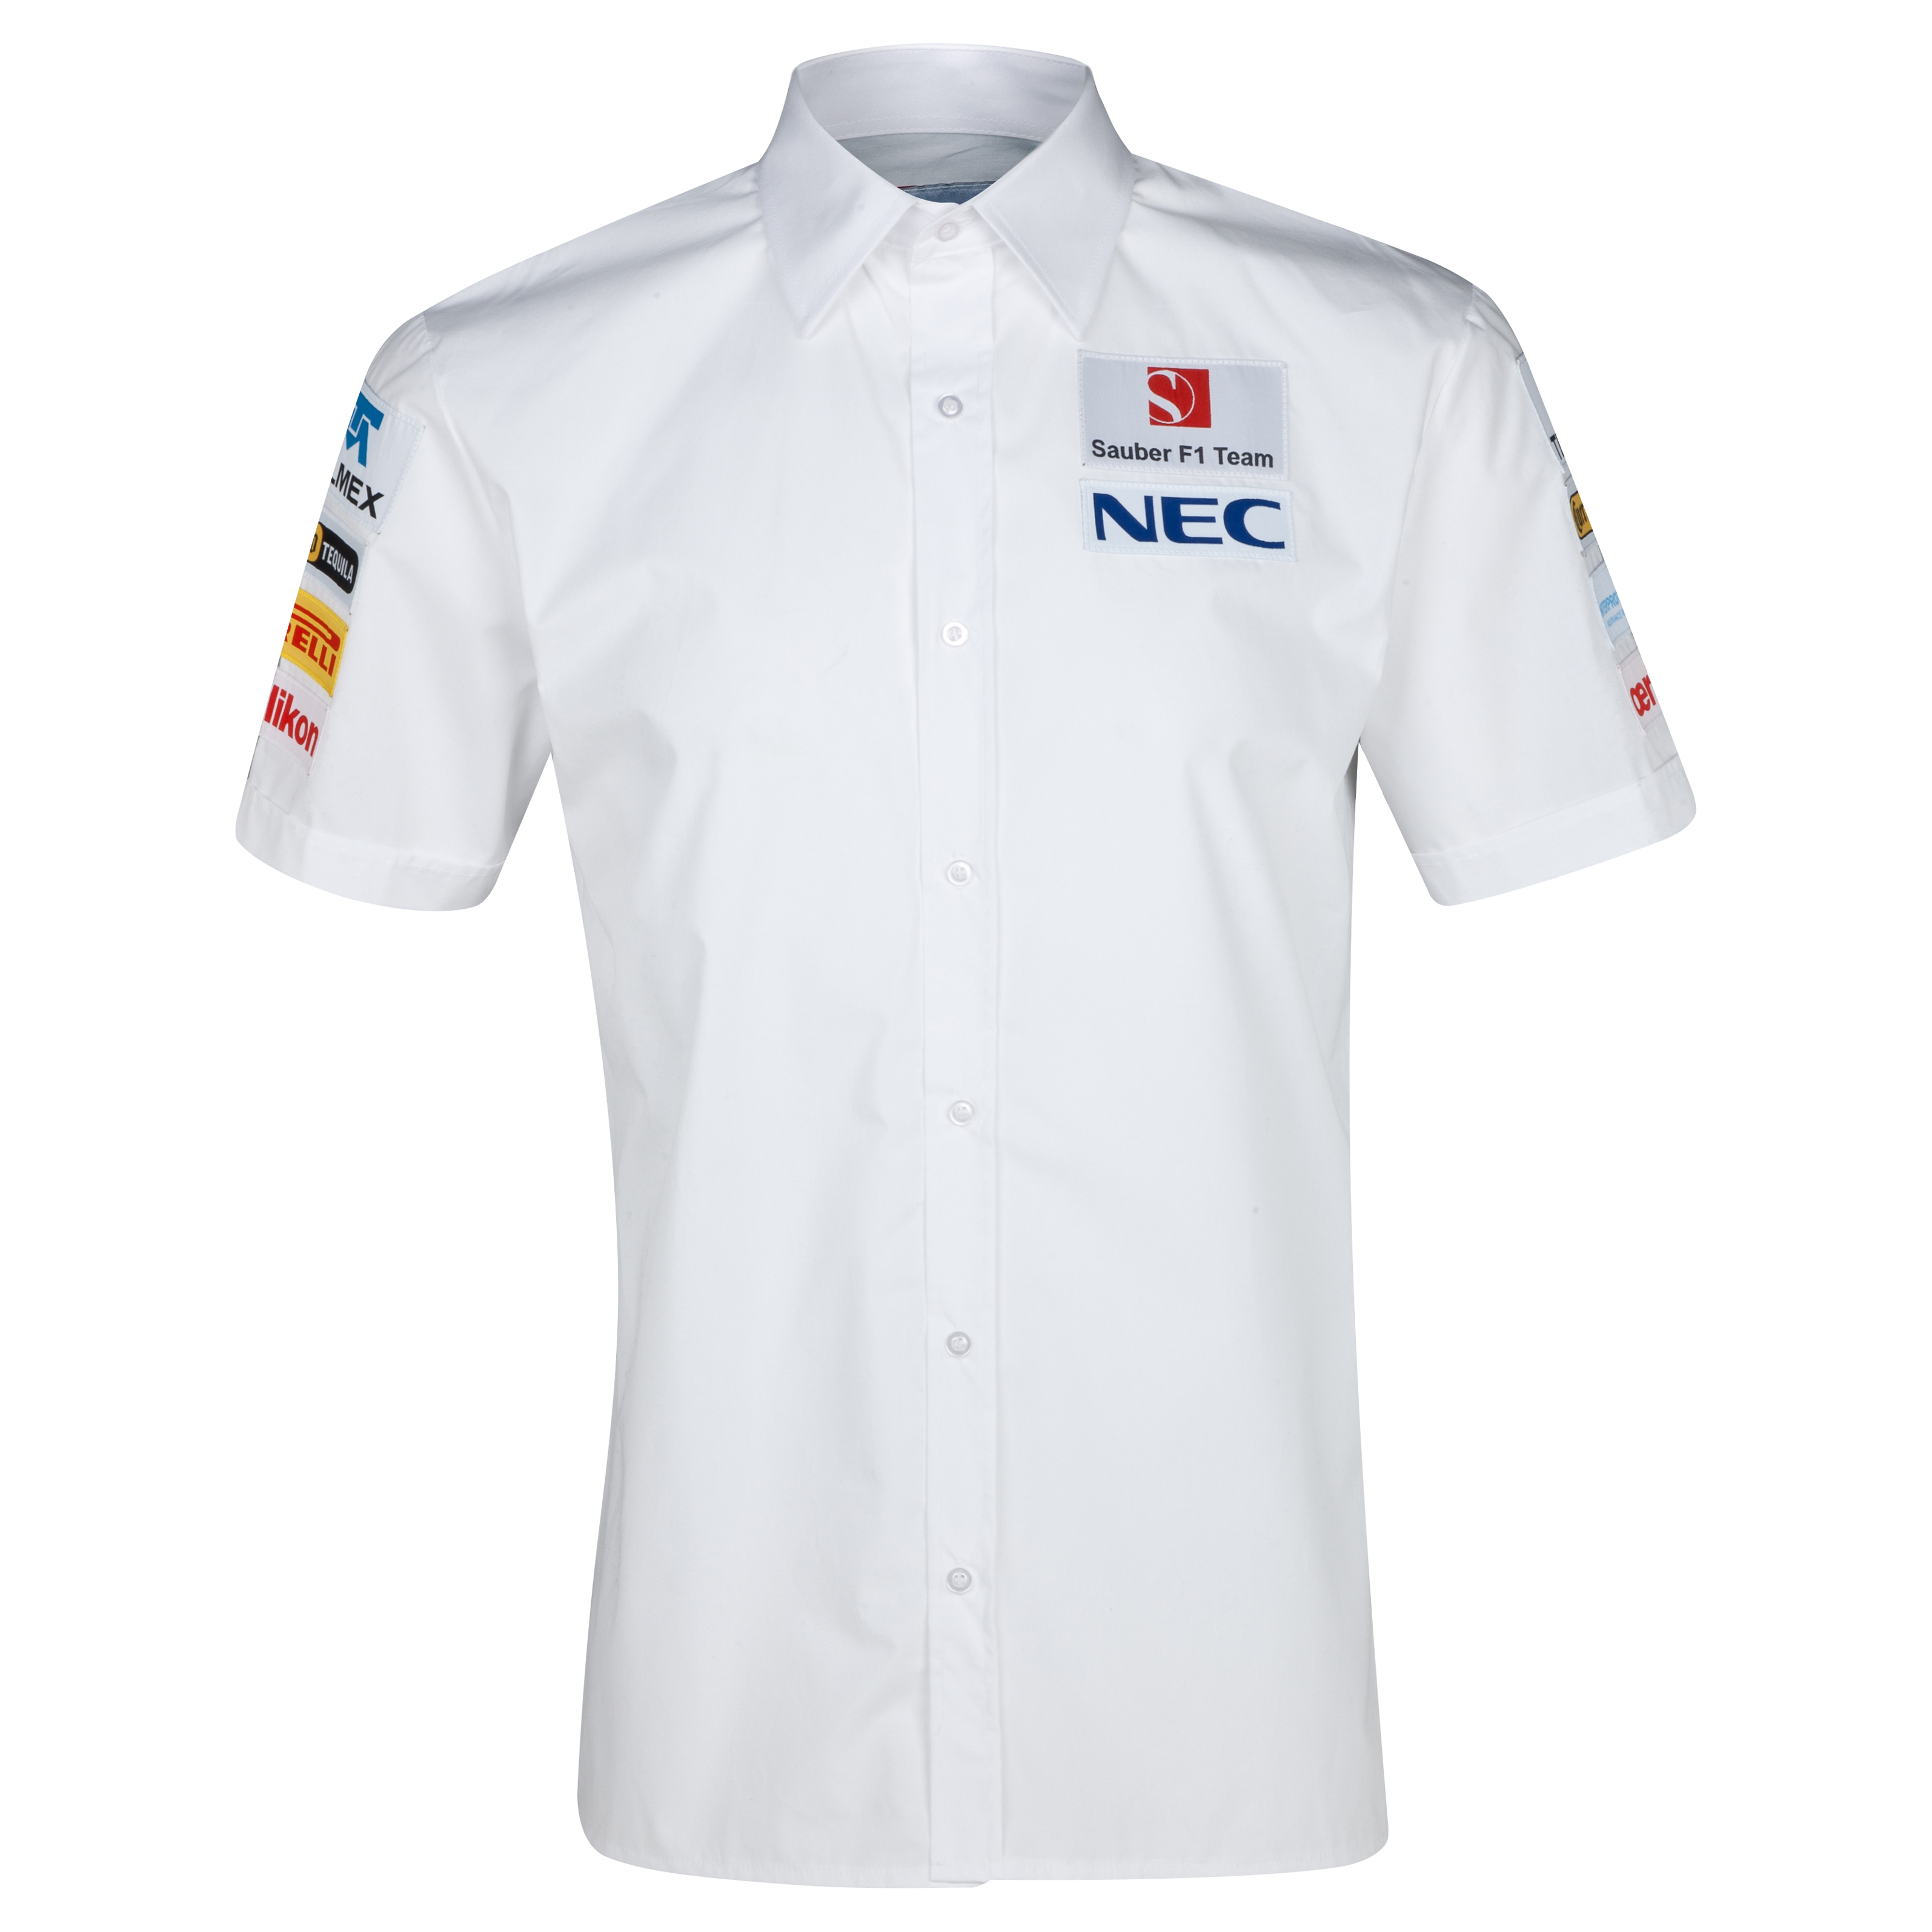 SAUBER F1 Team 2013 Sponsor Shirt